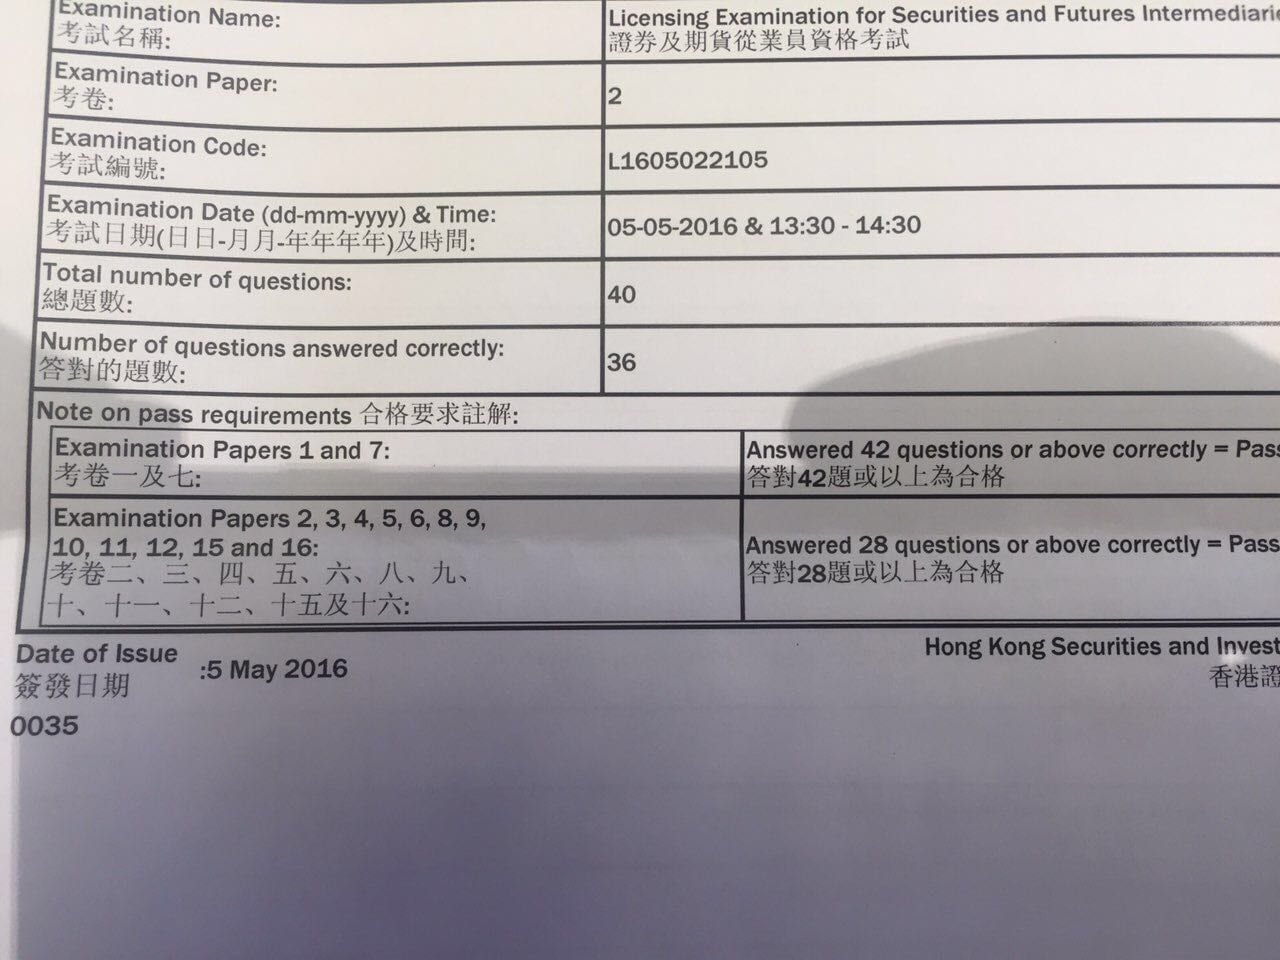 FDong 5/5/2016 LE Paper 2 證券期貨從業員資格考試卷二 Pass